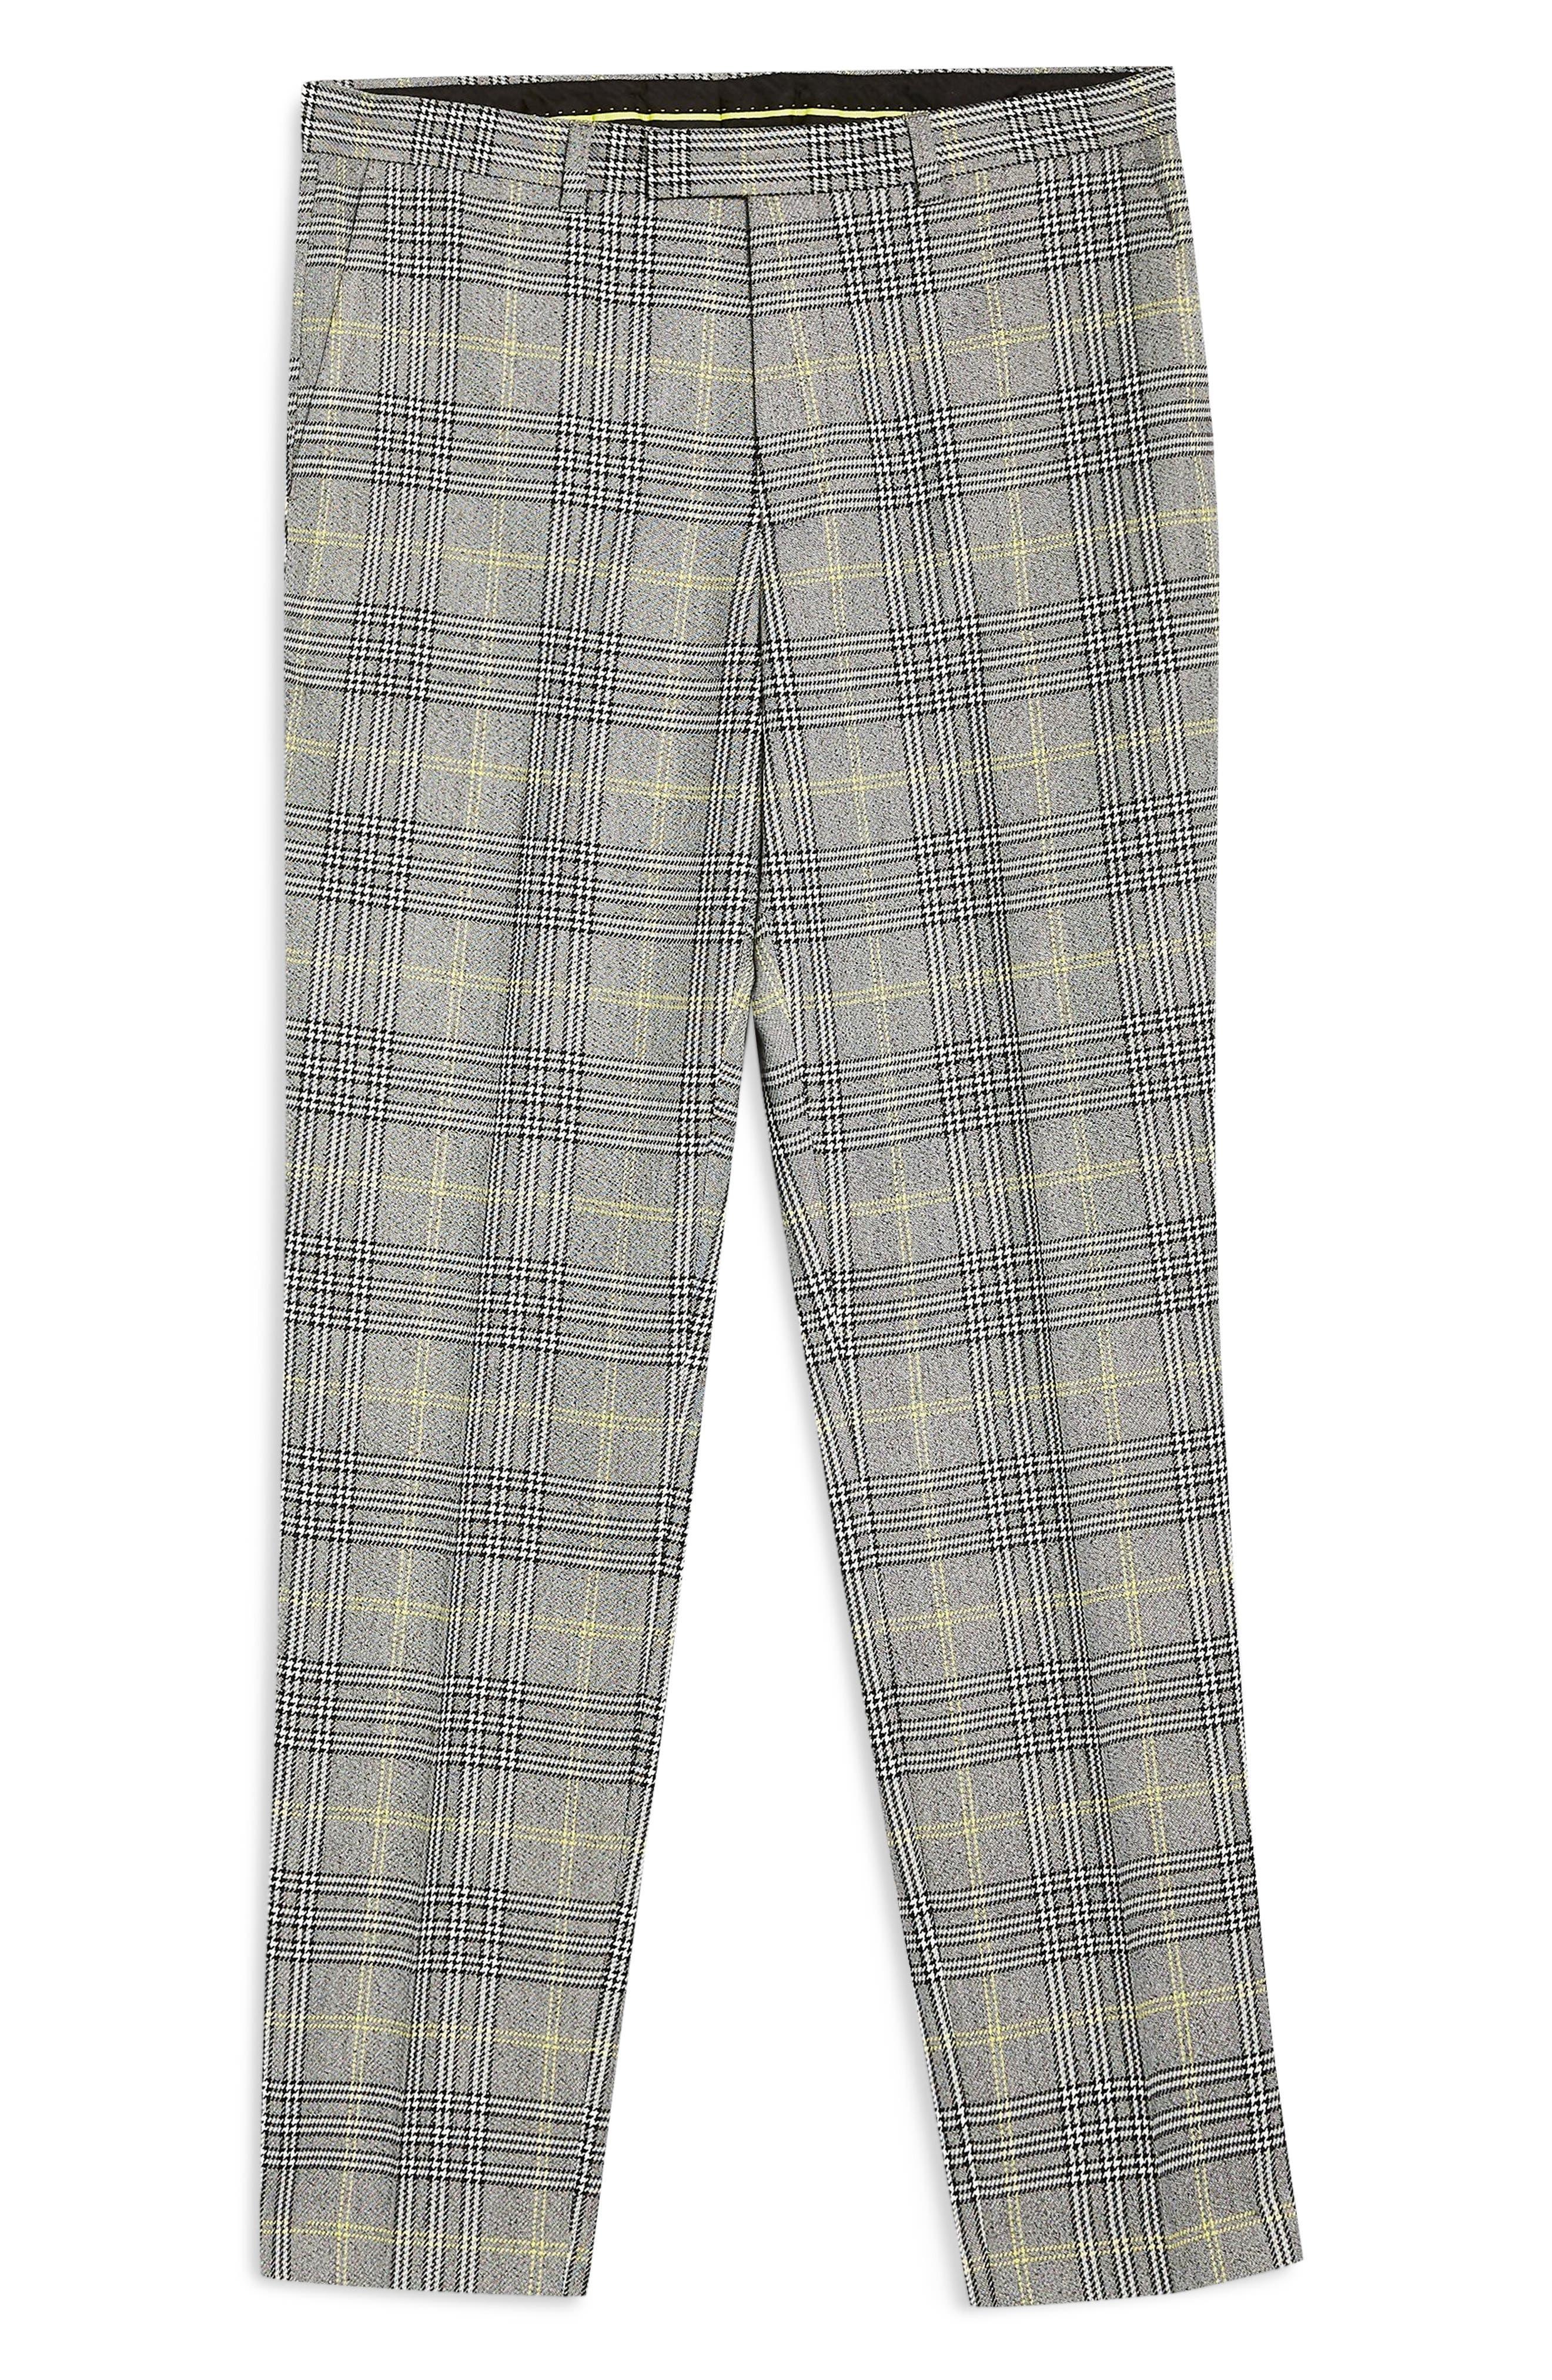 TOPMAN, Check Slim Trousers, Alternate thumbnail 5, color, GREY